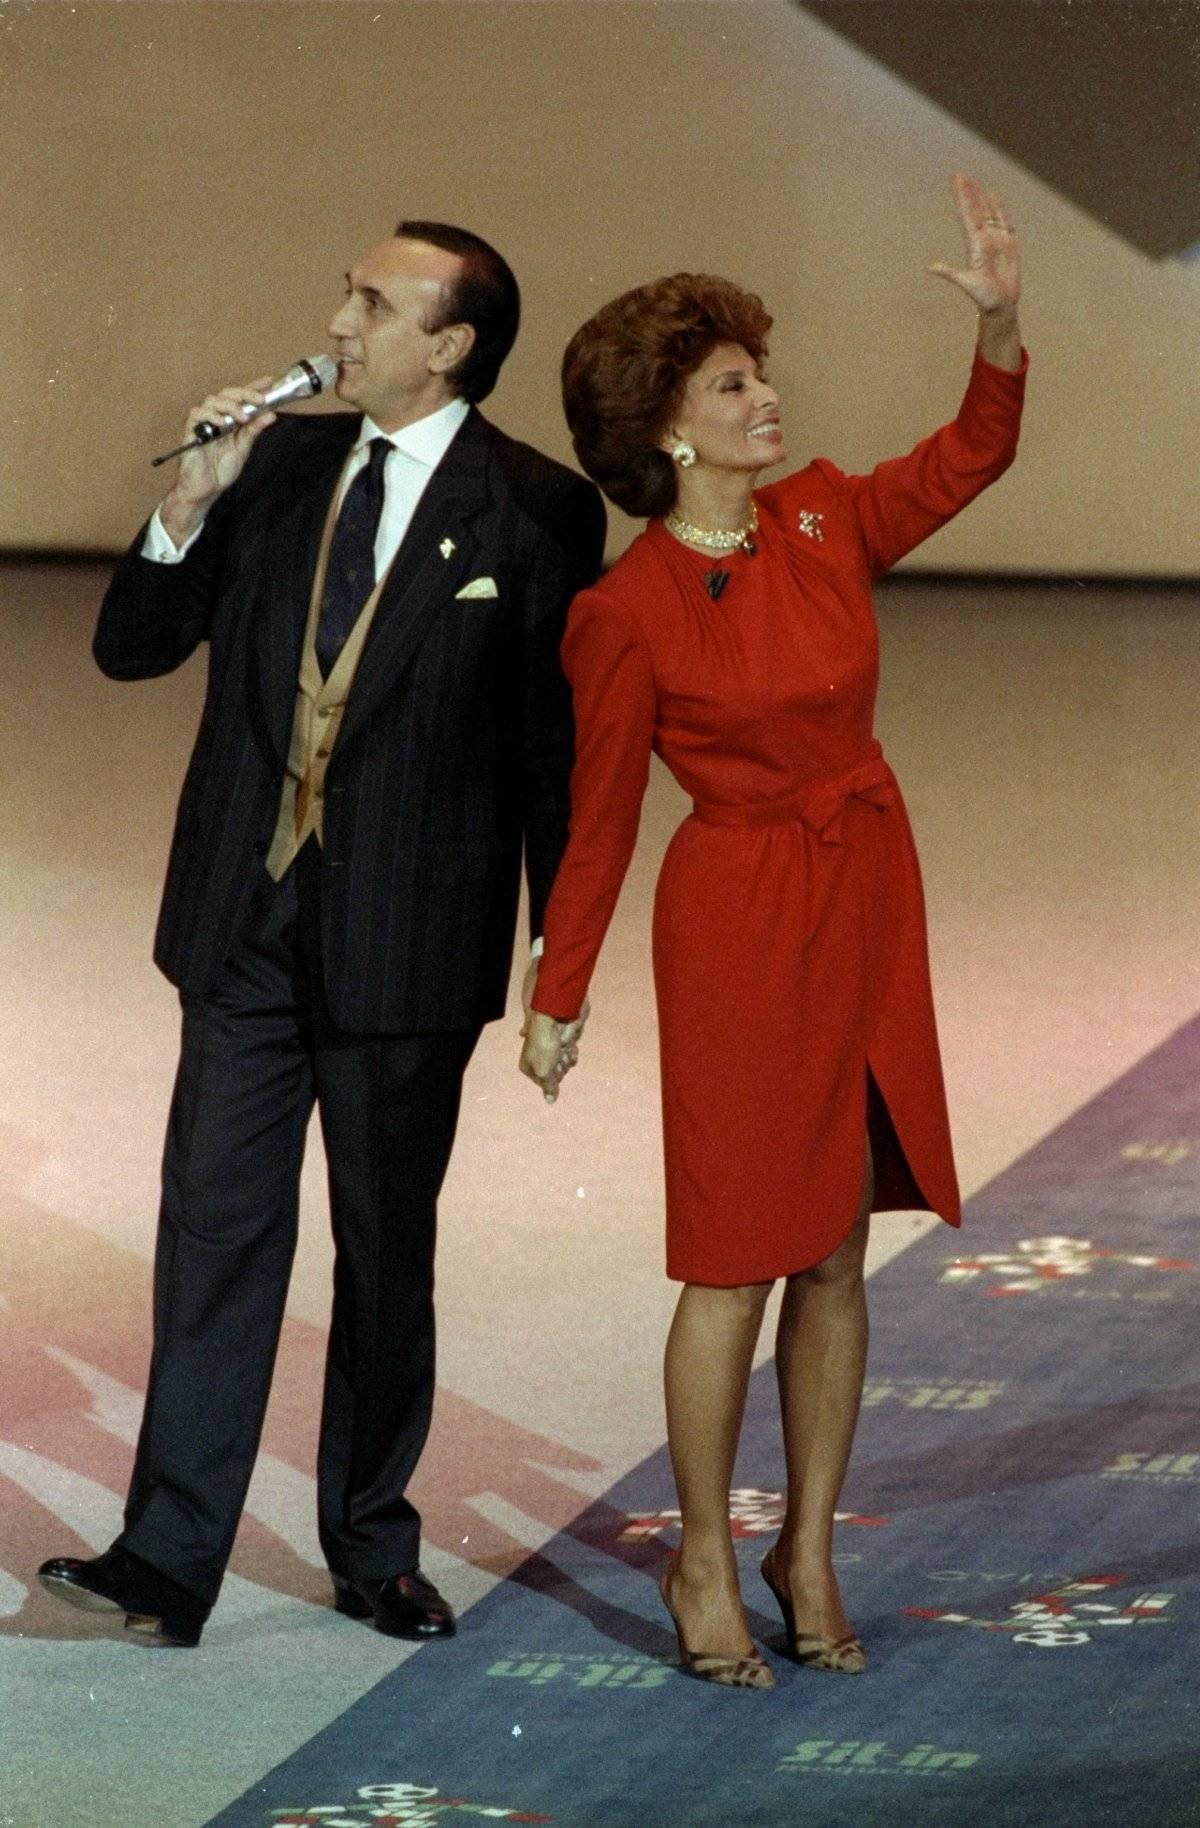 Sophia Loren fue protagonista de un sorteo / imagen: Getty Images